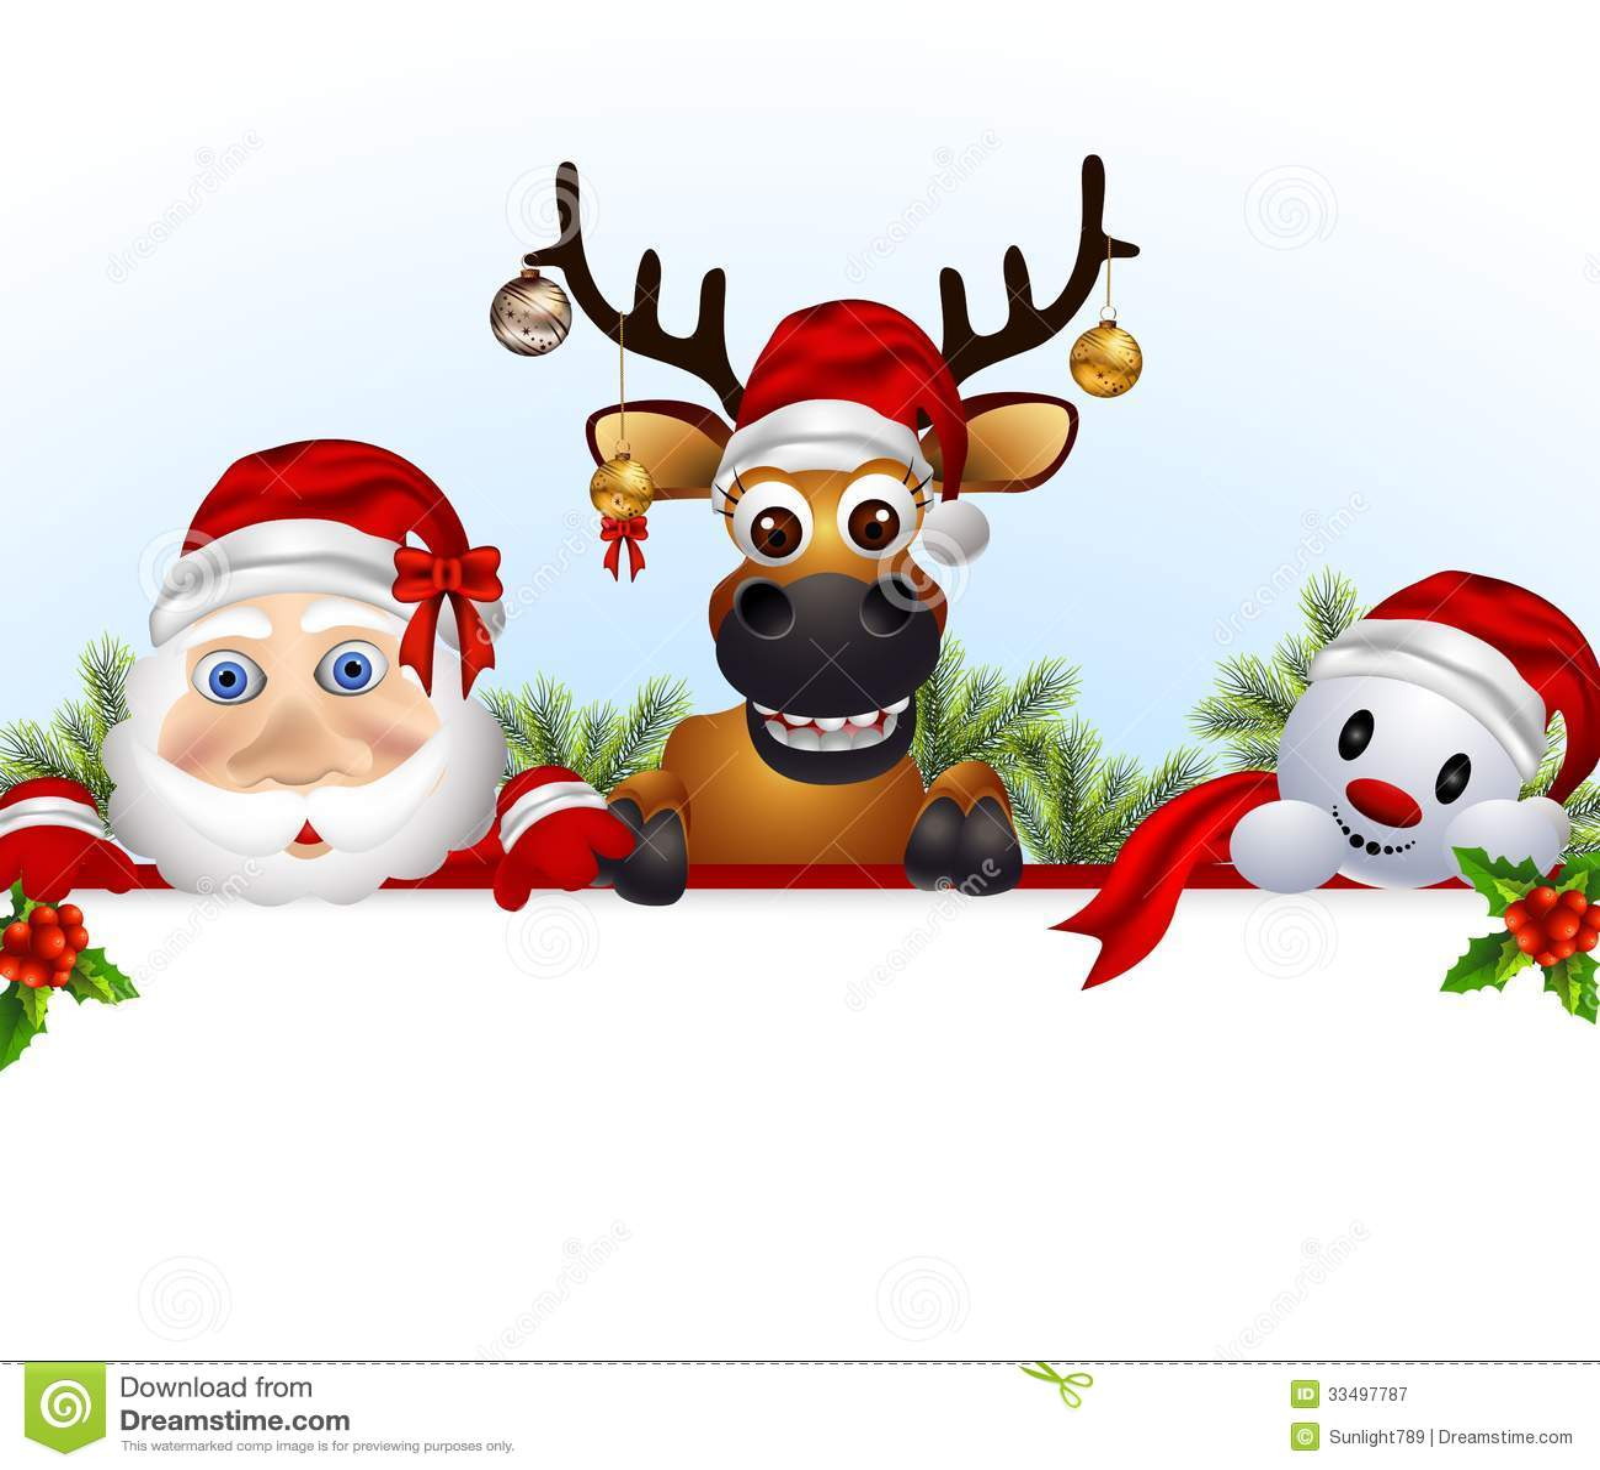 santa clausdeerand snowman cartoon with blank sign - Snowman Santa